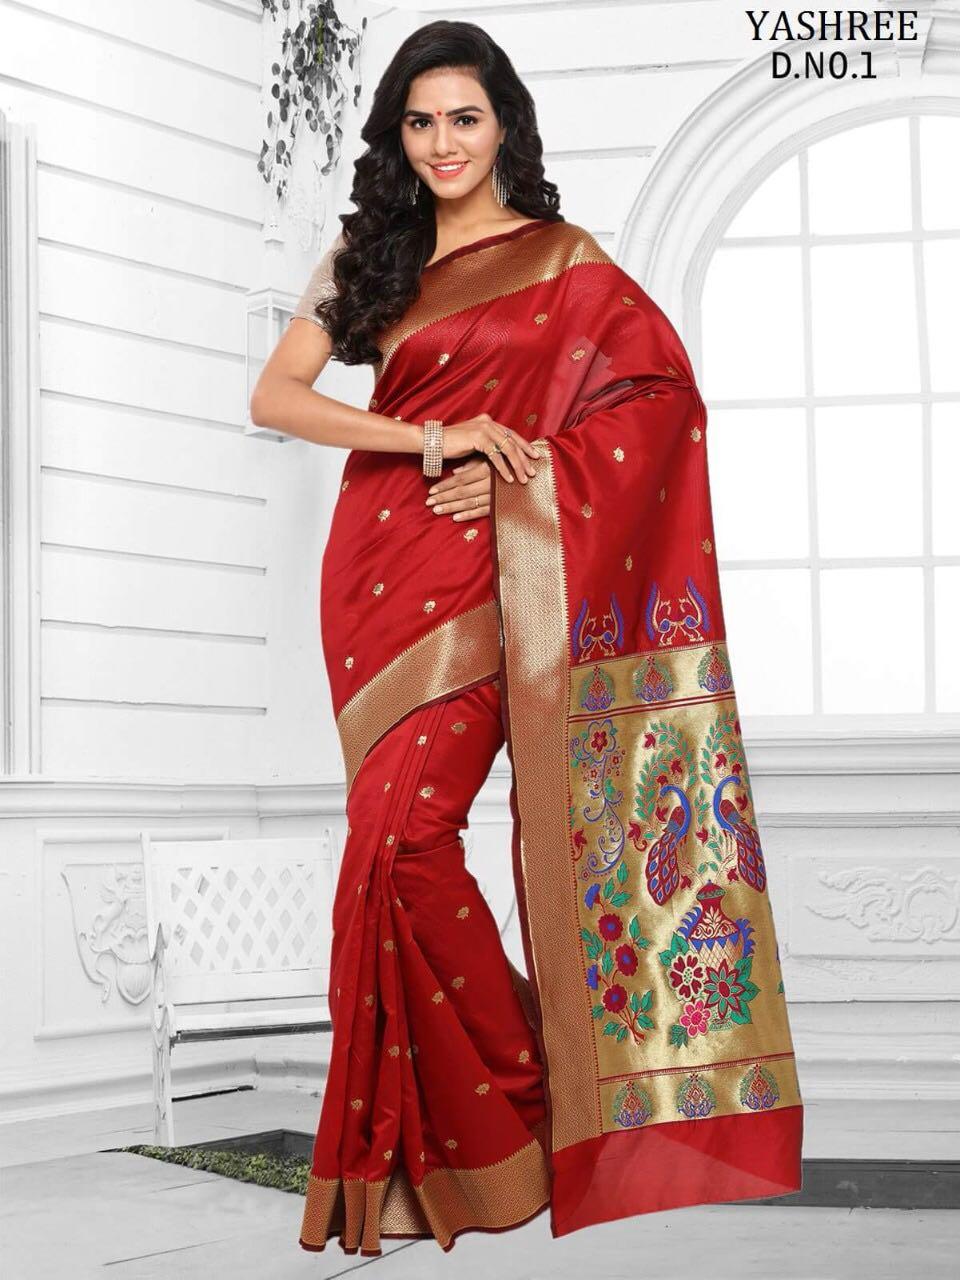 Yadunandan Fashion Yashree 1